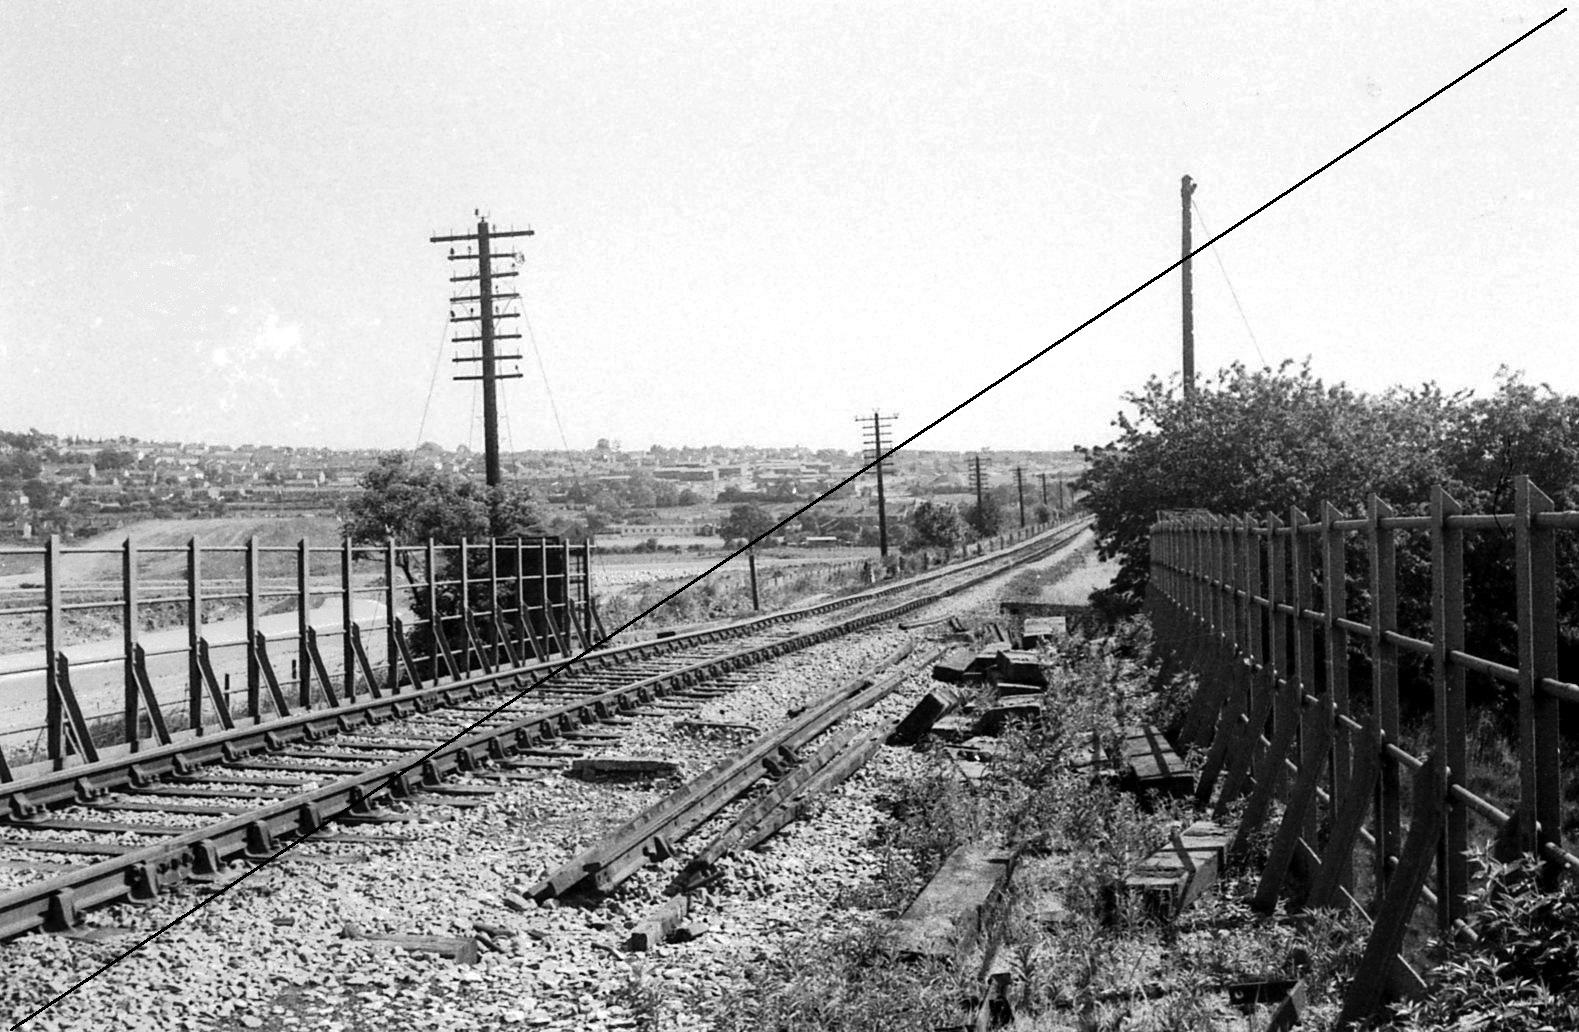 LDE019-Meadowgate Lane, Beighton-LD&ECR Bridge over Norwood Colliery-Killamarsh (M.R.) Branch-View South towards Killamarsh-09-06-1977.jpg